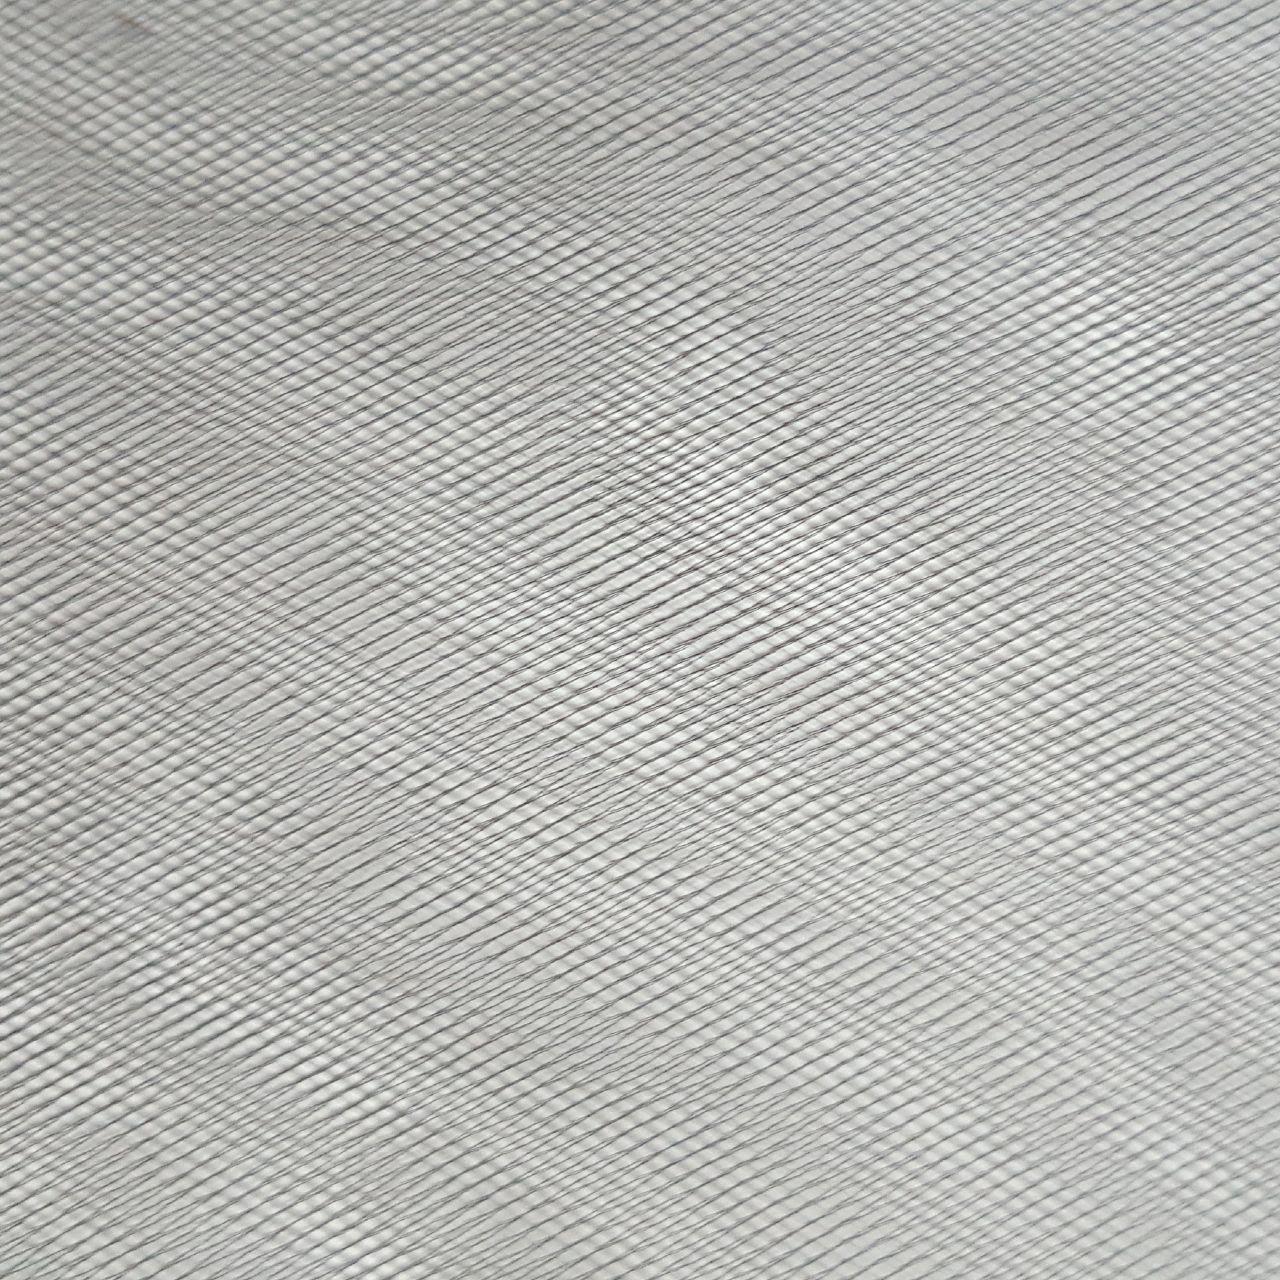 جوراب زنانه ال سون کد PH323 -  - 3